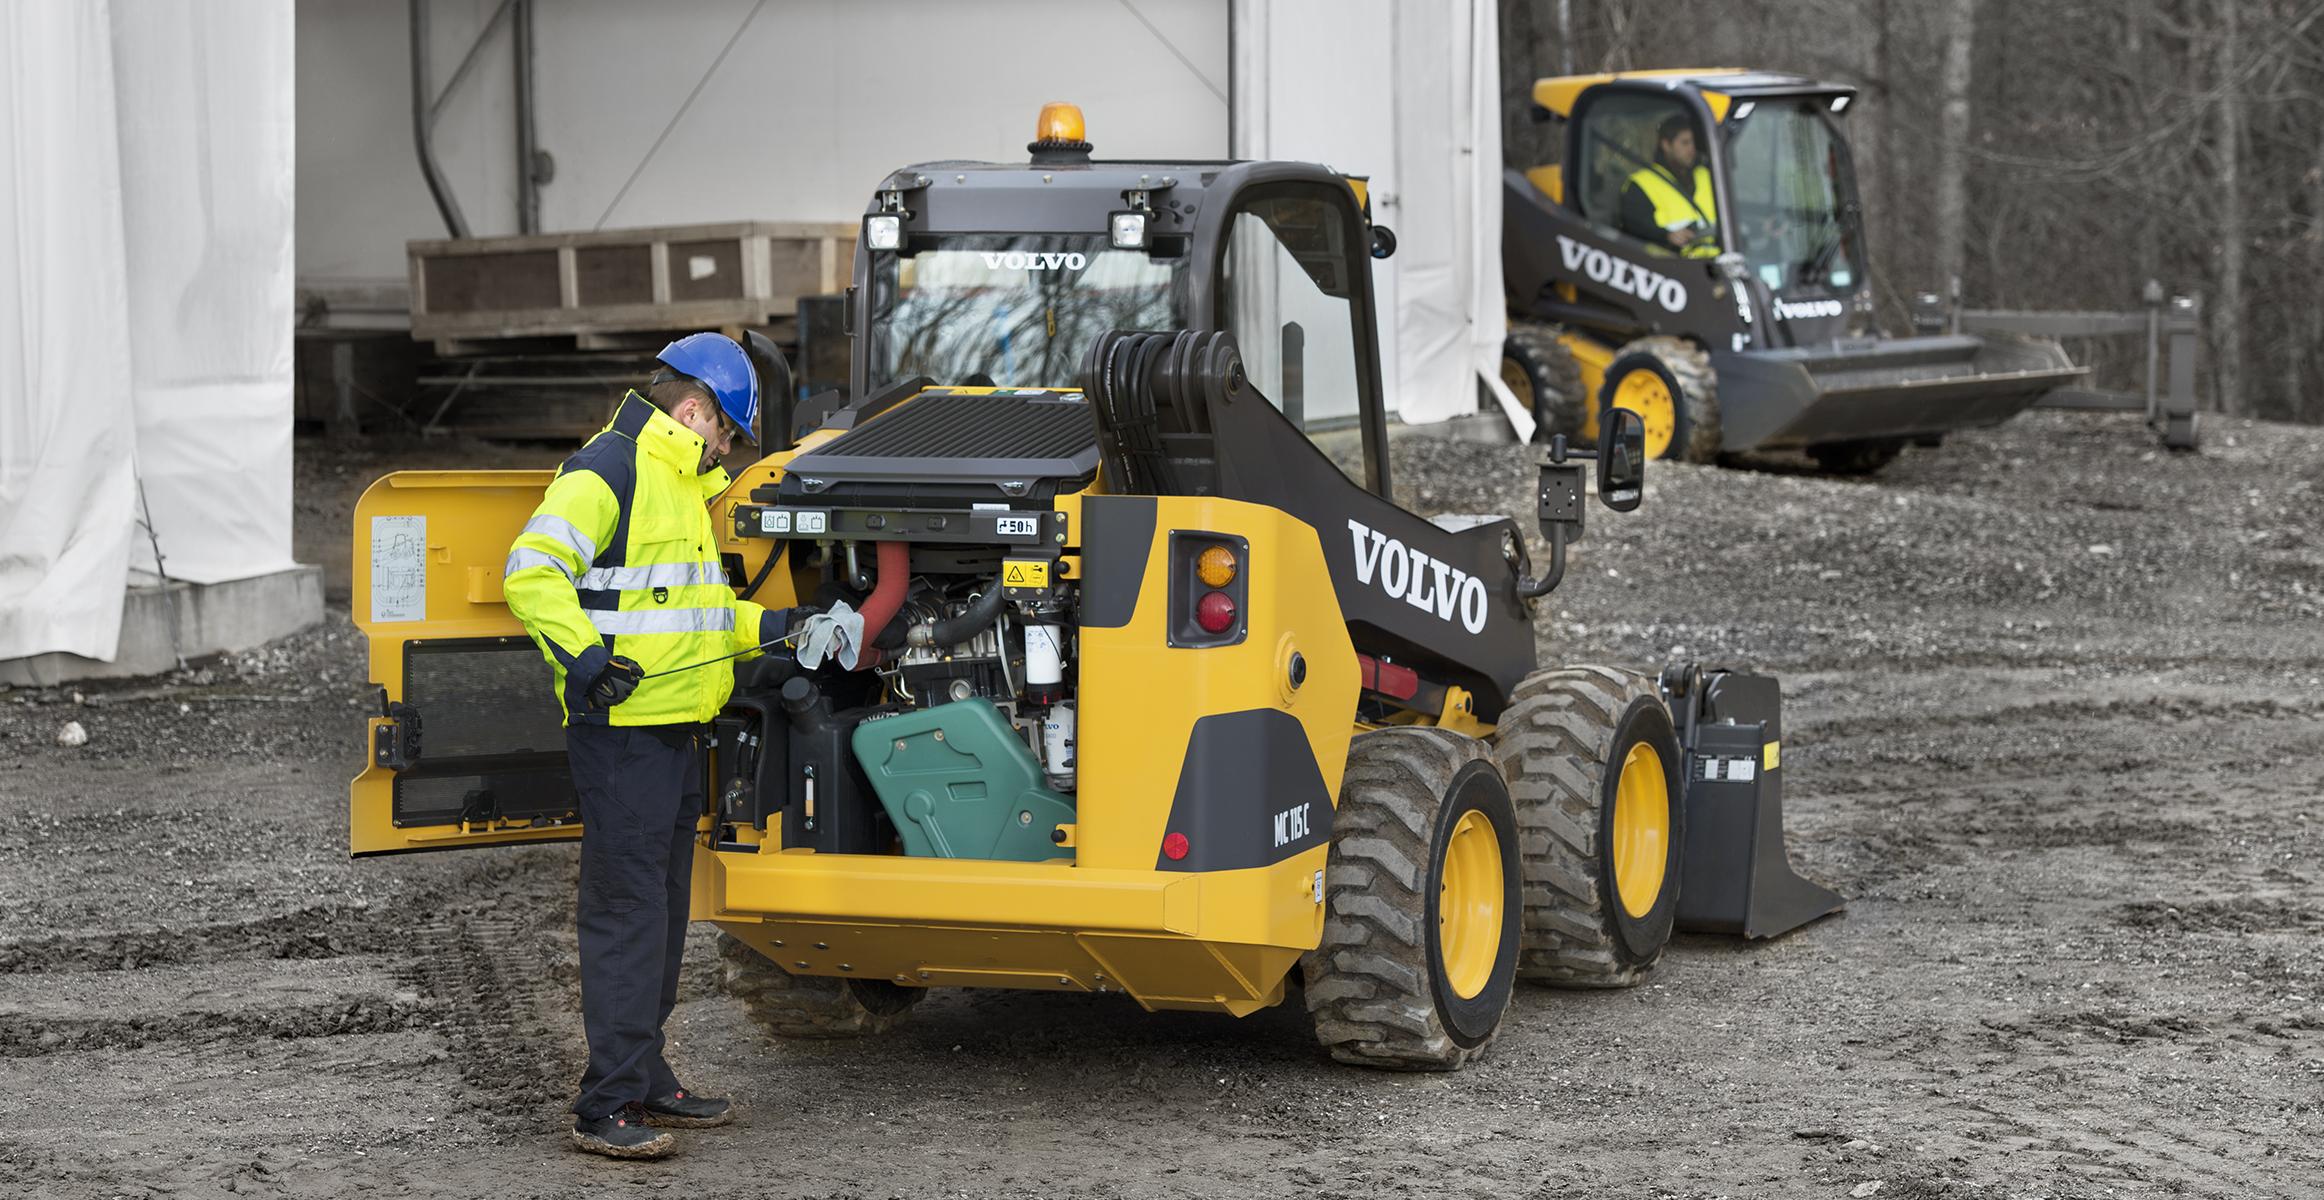 Skid Steer Loaders | Volvo Construction Equipment Global